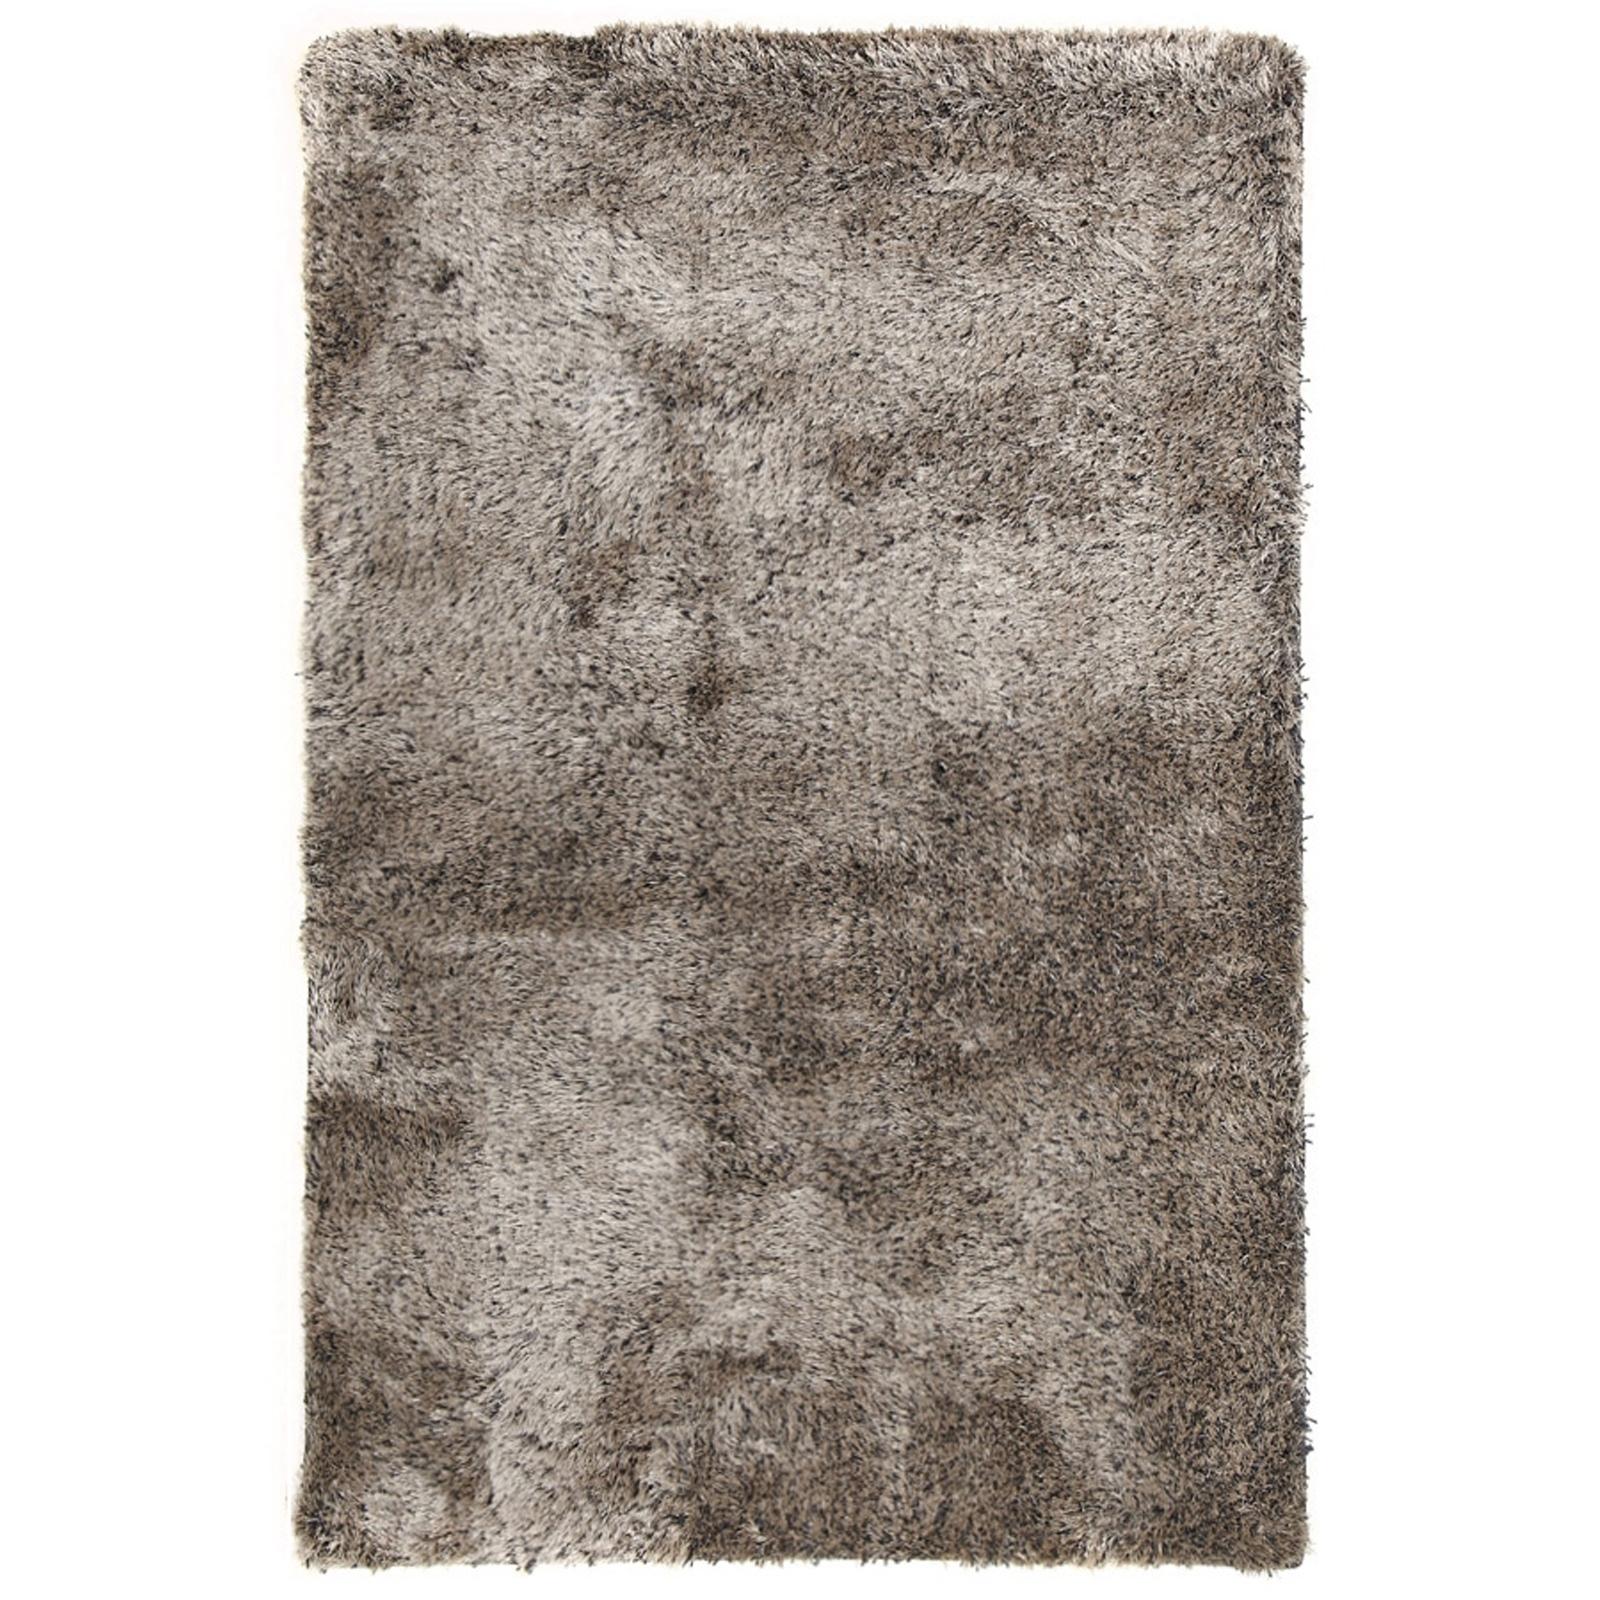 office modern carpet texture preview product spotlight. Rug Texture. New-floor-rug-modern-thick-soft-plush Office Modern Carpet Texture Preview Product Spotlight T